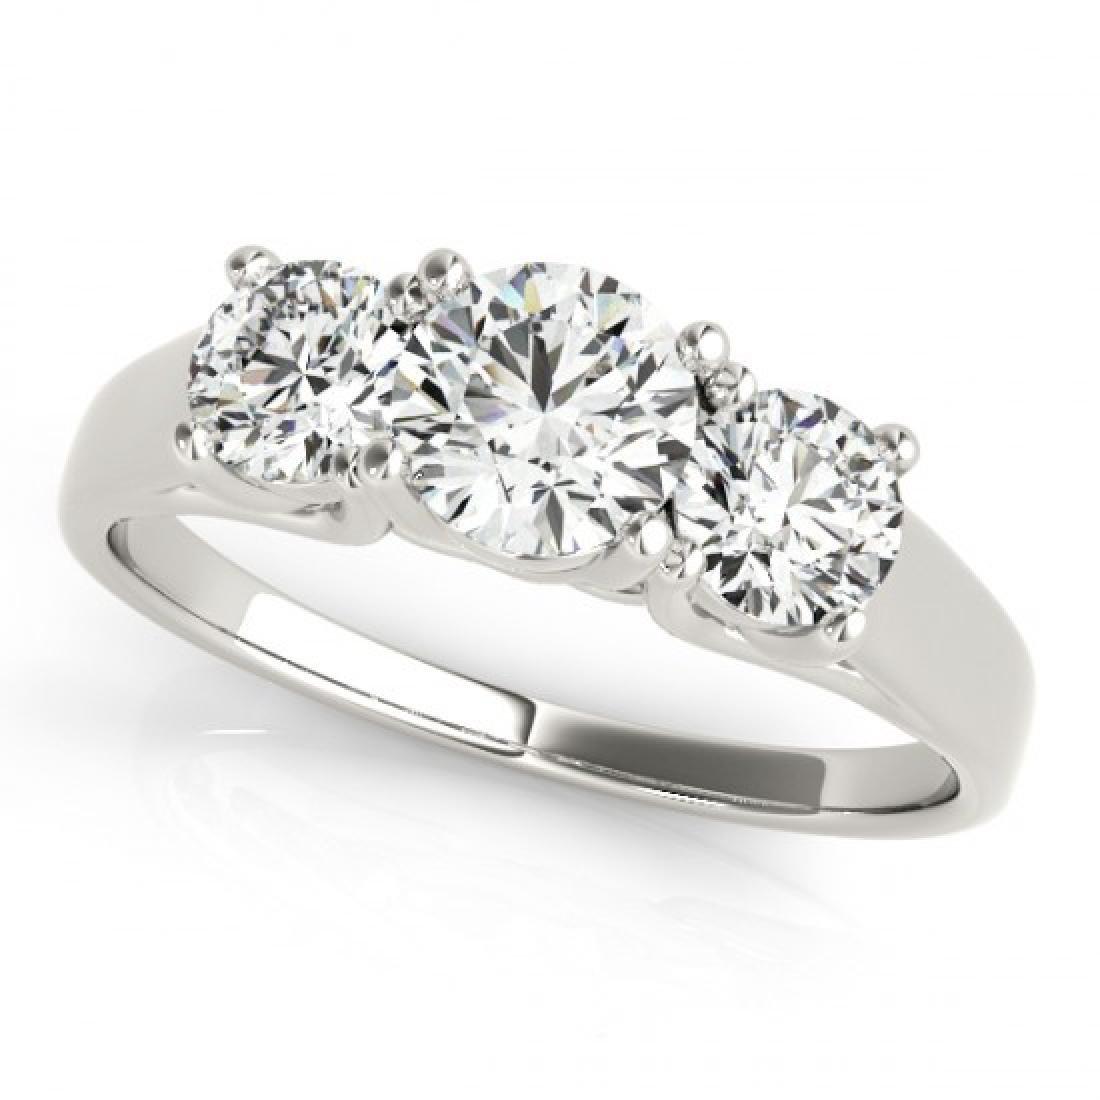 1.5 CTW Certified VS/SI Diamond 3 Stone Ring 14K White - 2